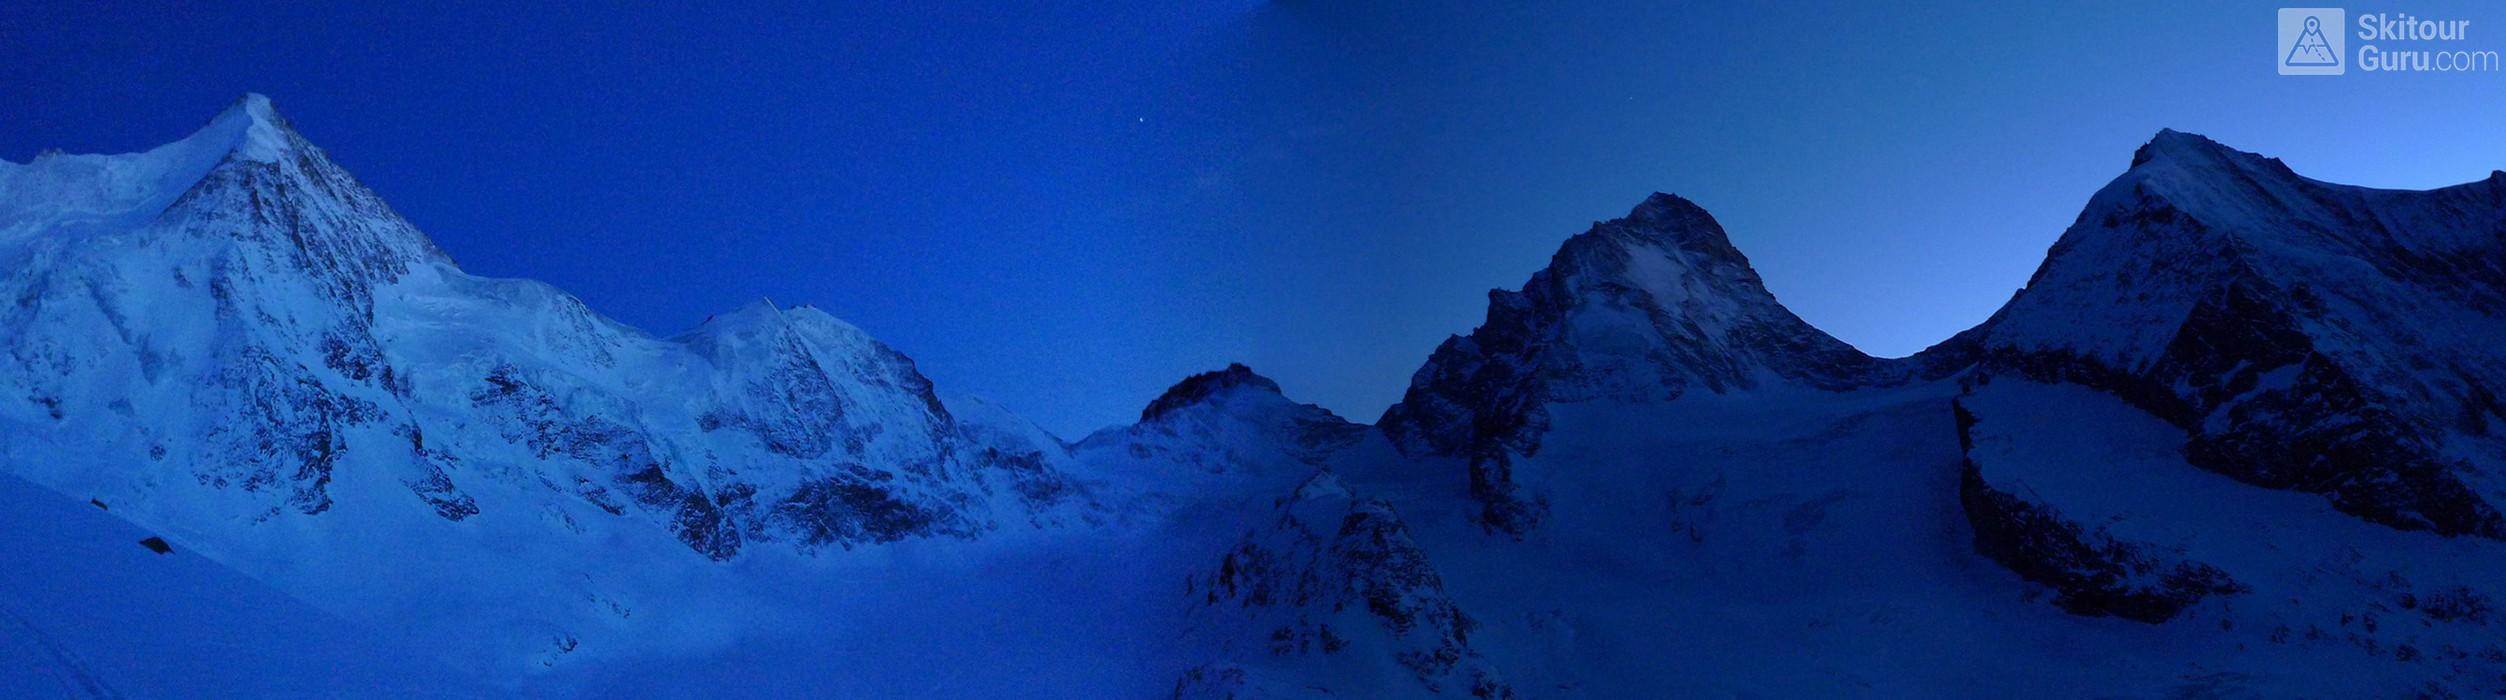 Cabane du Mountet Walliser Alpen / Alpes valaisannes Švýcarsko panorama 12